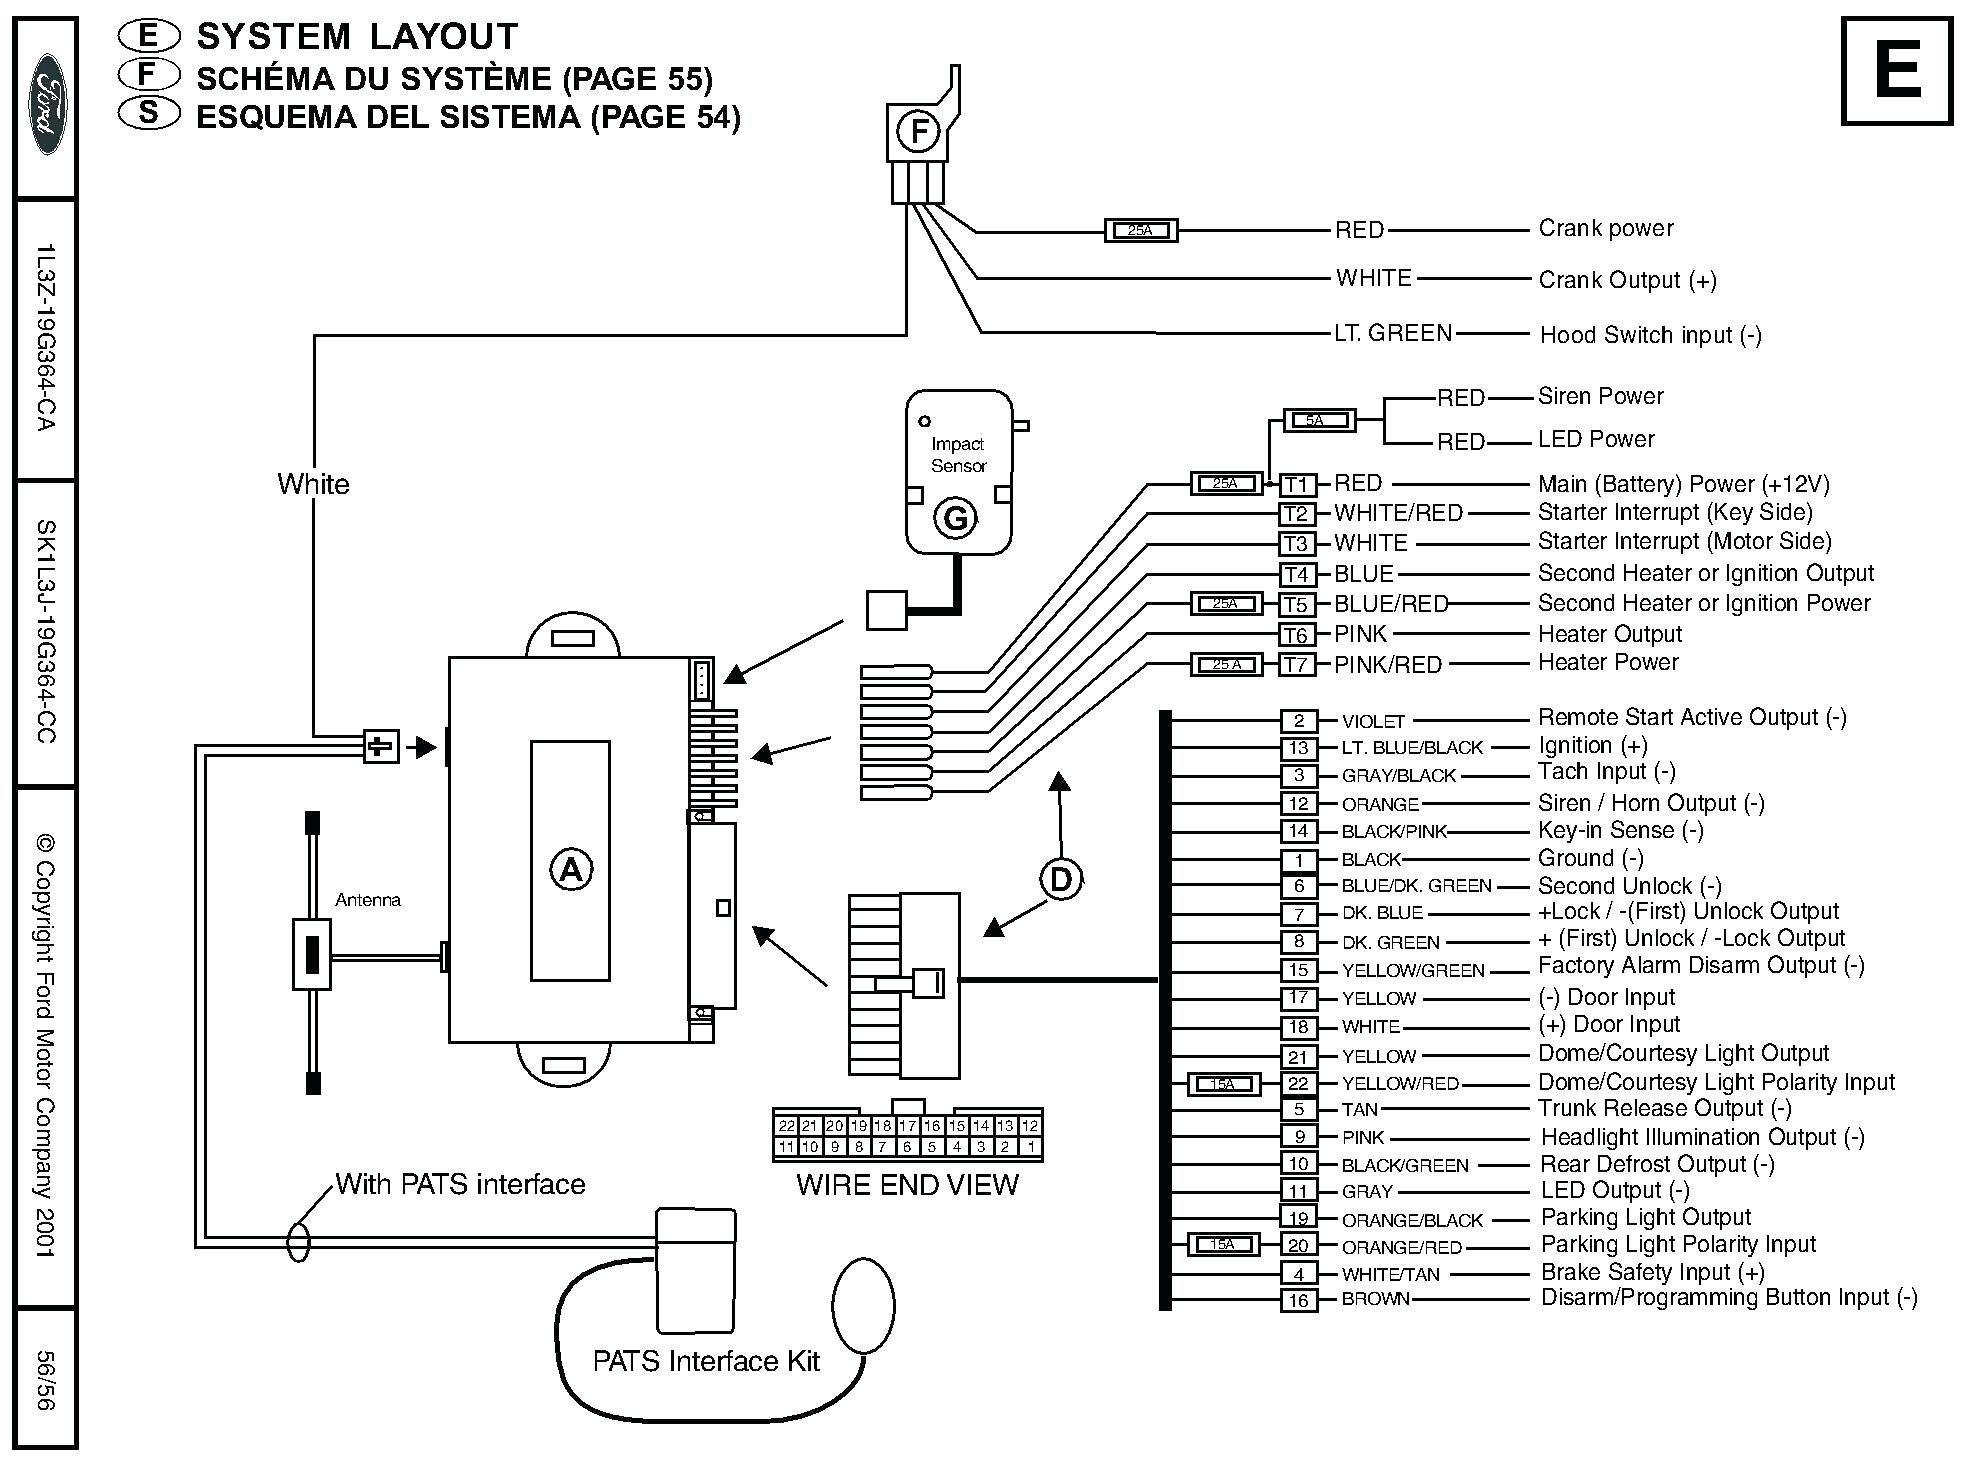 Interconnected Smoke Alarm Wiring Diagram Sc 8579] Smoke Detectors Wiring Blueprint Of Interconnected Smoke Alarm Wiring Diagram